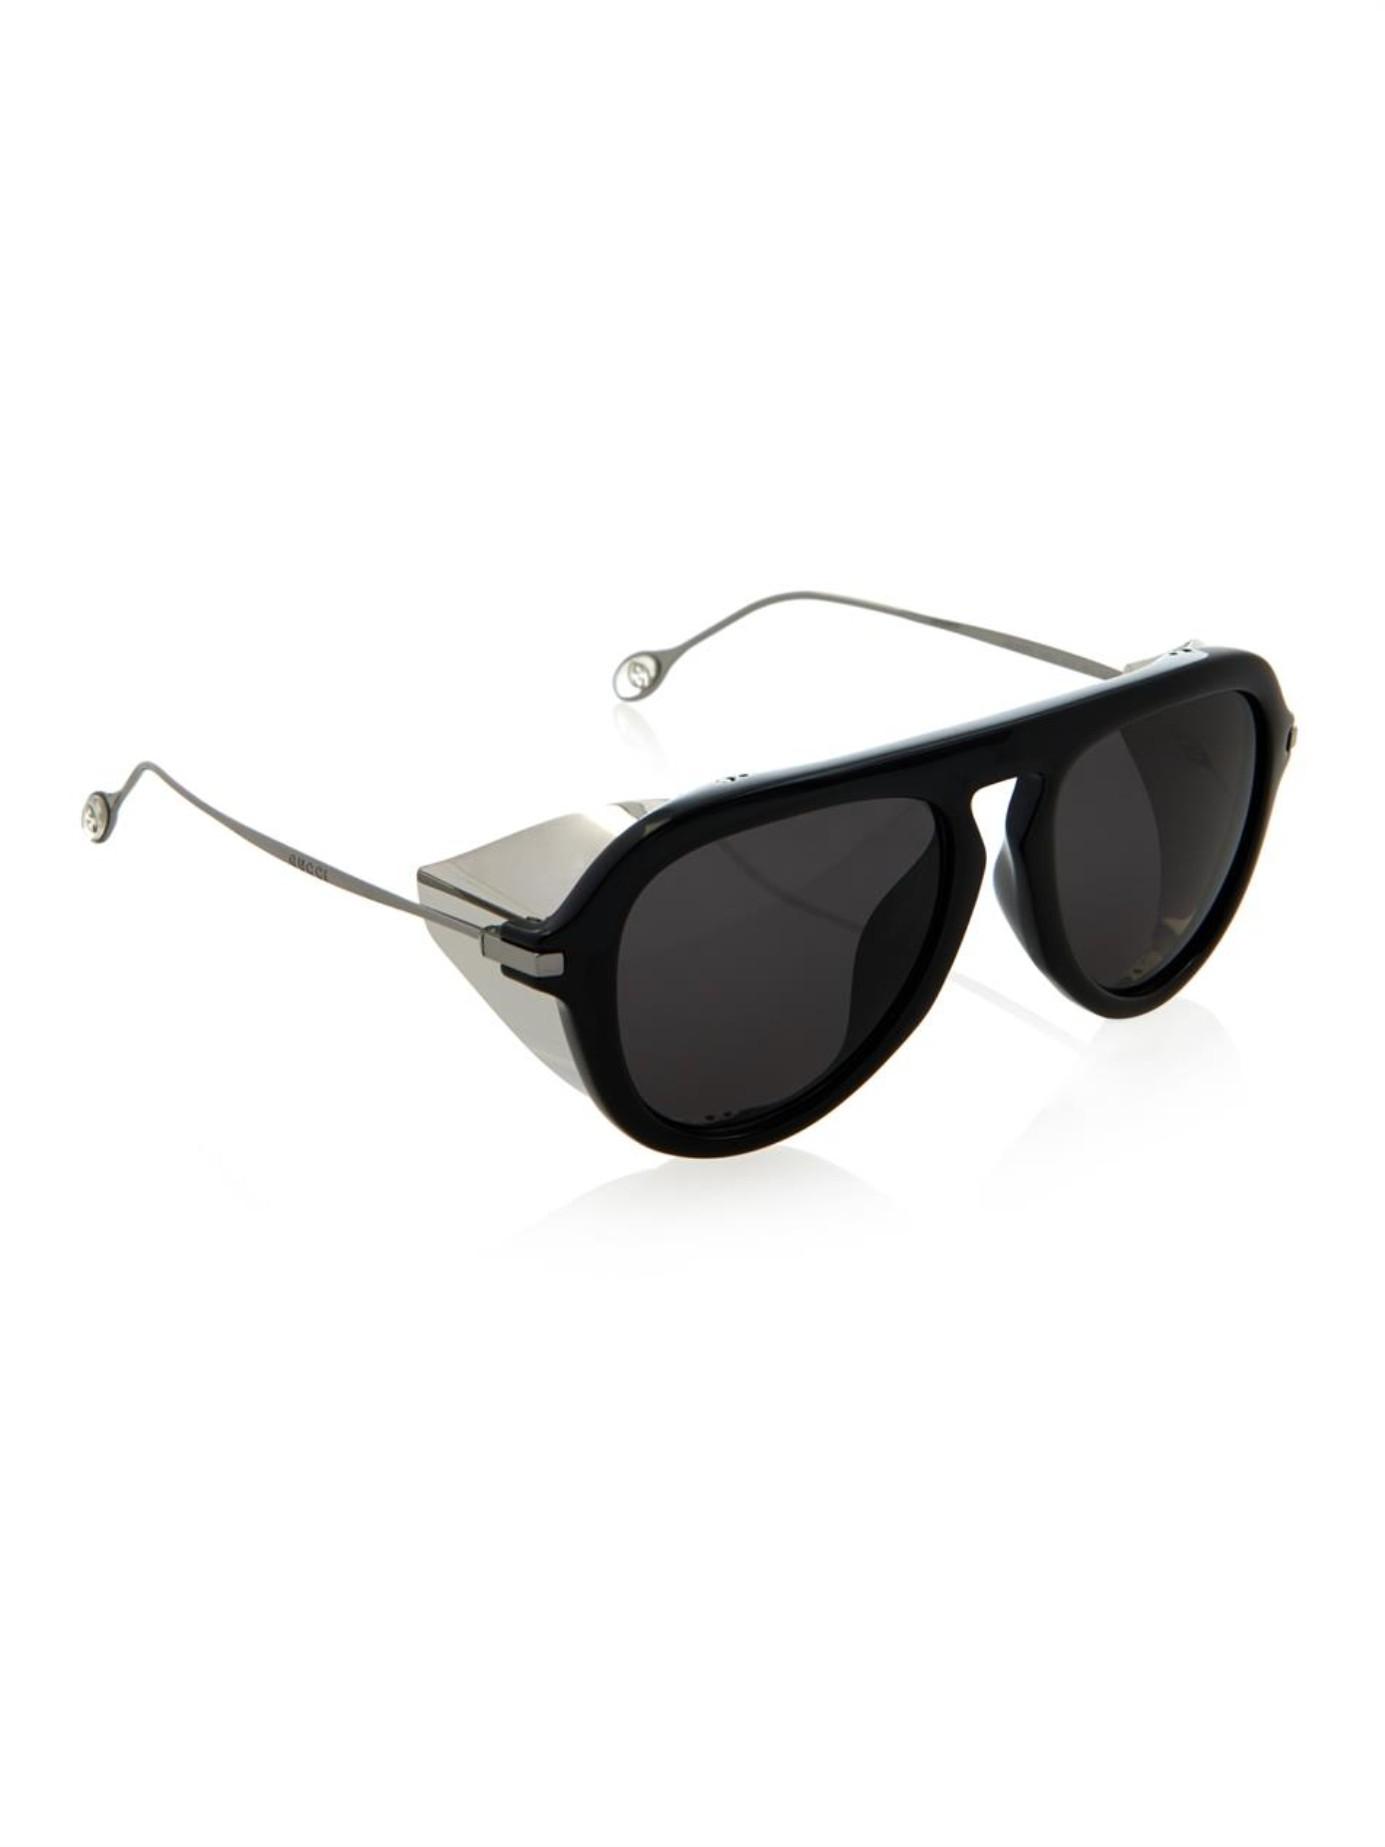 67d6e95b5 Gucci Metal-Blinker Aviator-Style Sunglasses in Black - Lyst